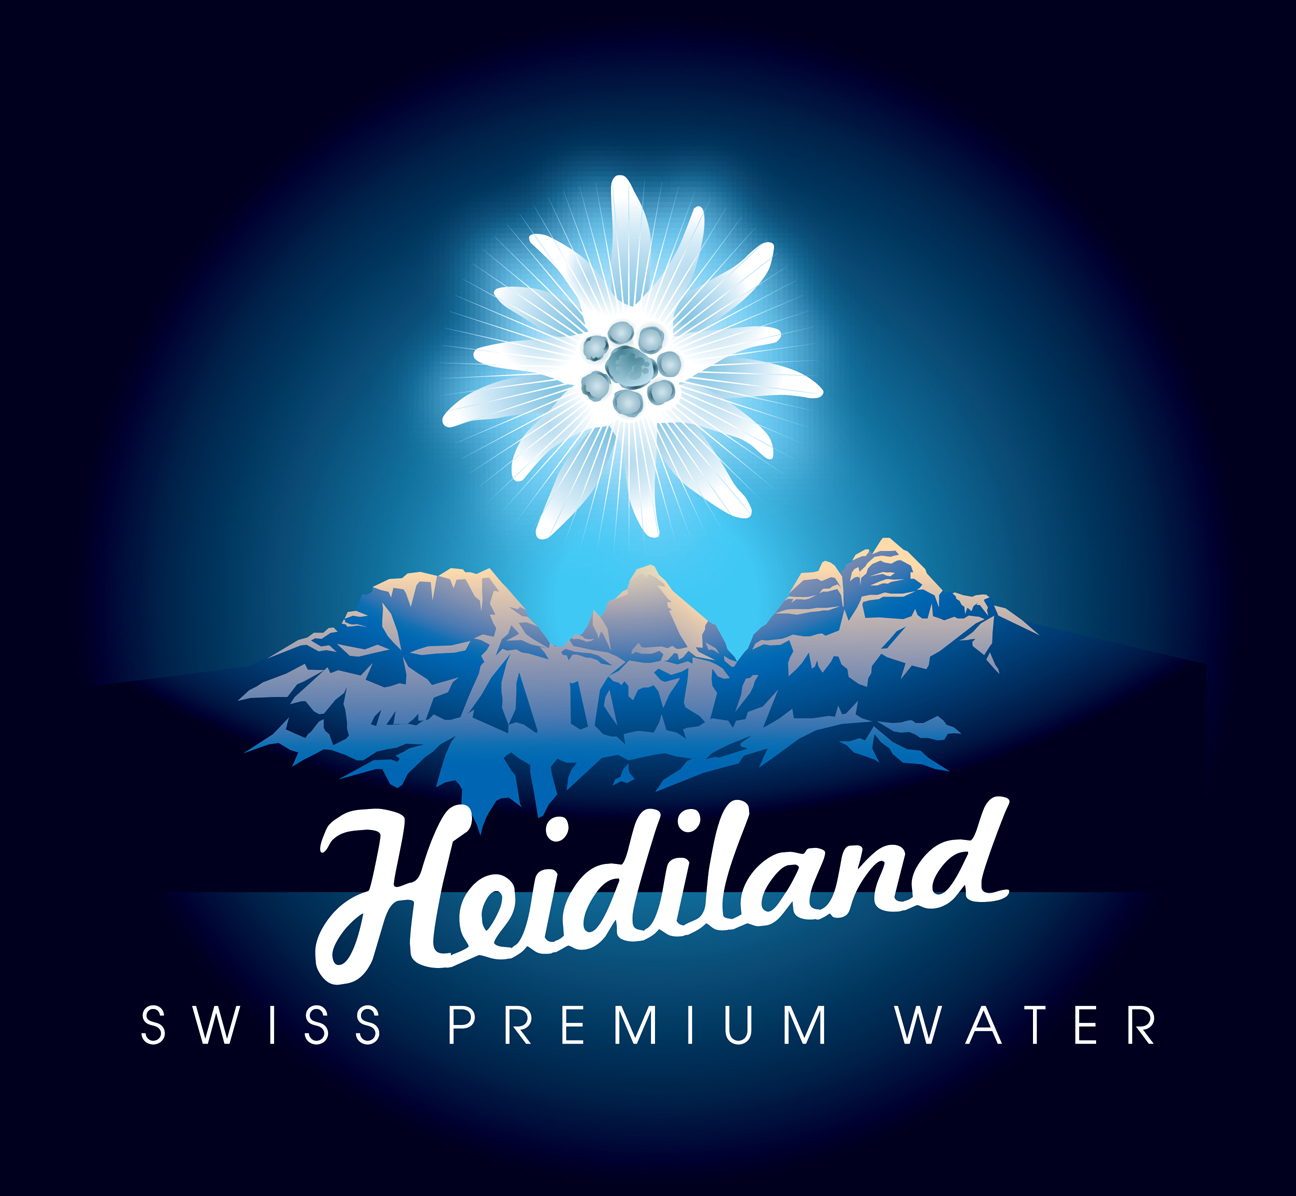 heidiland_detail_1_1296